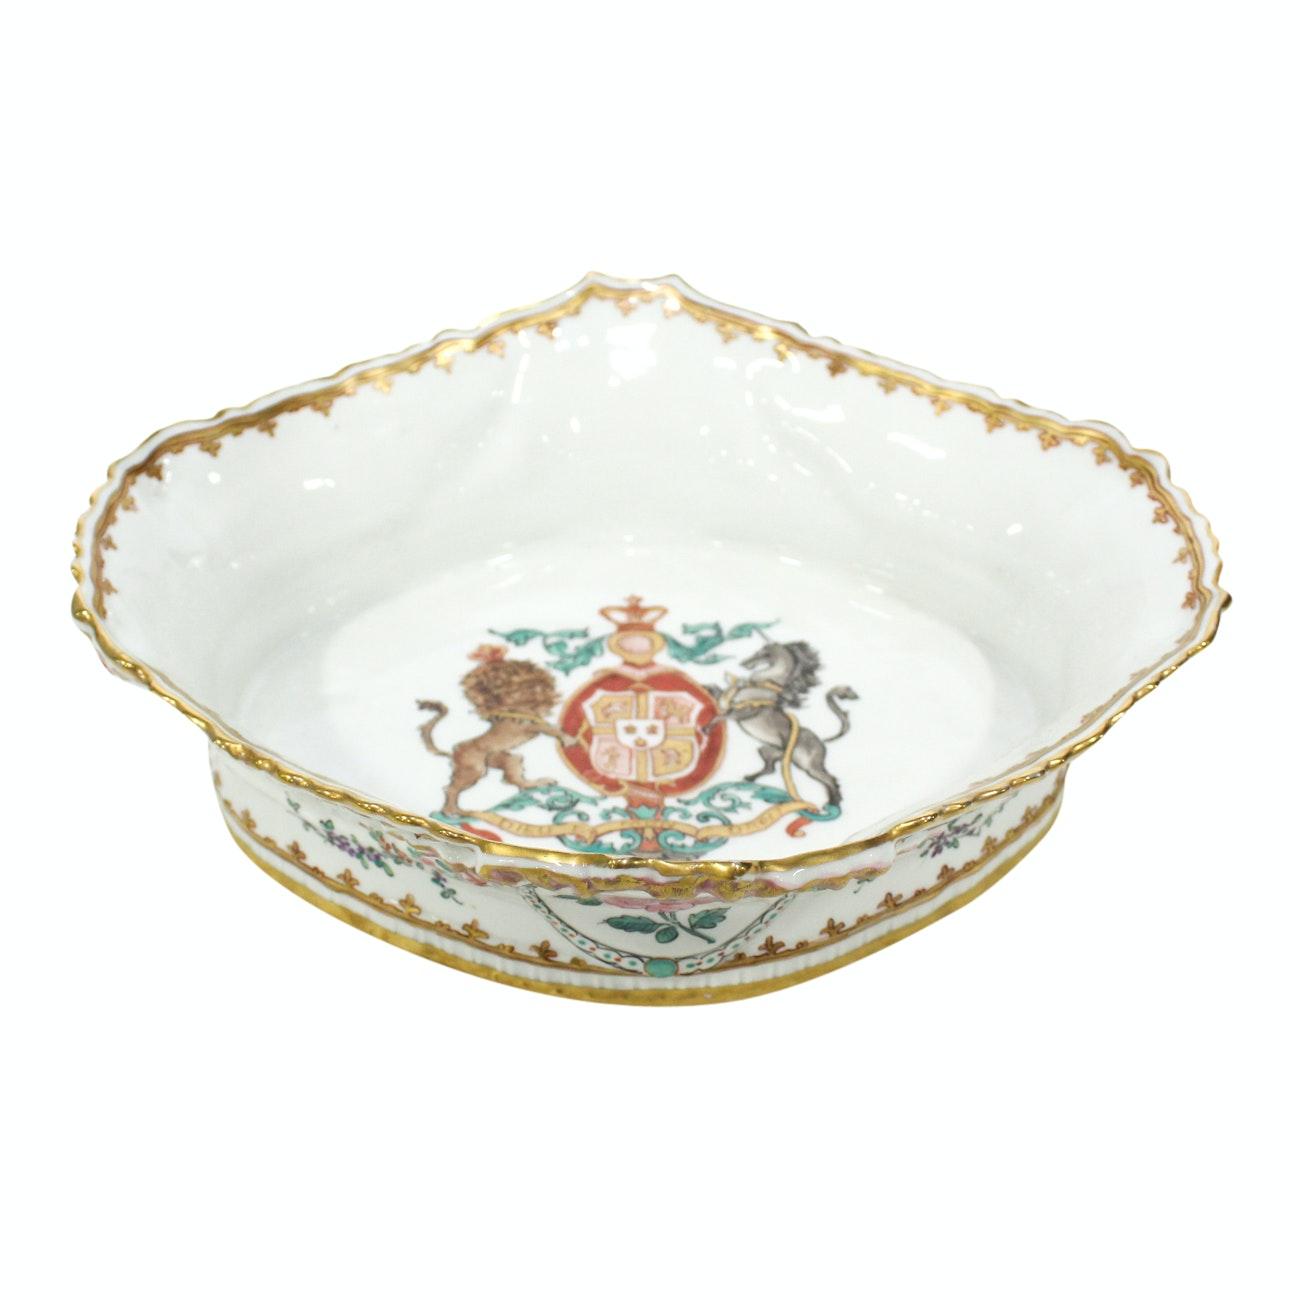 French Armorial Porcelaine De Paris, Sampson Style Oval Dish, 20th Century